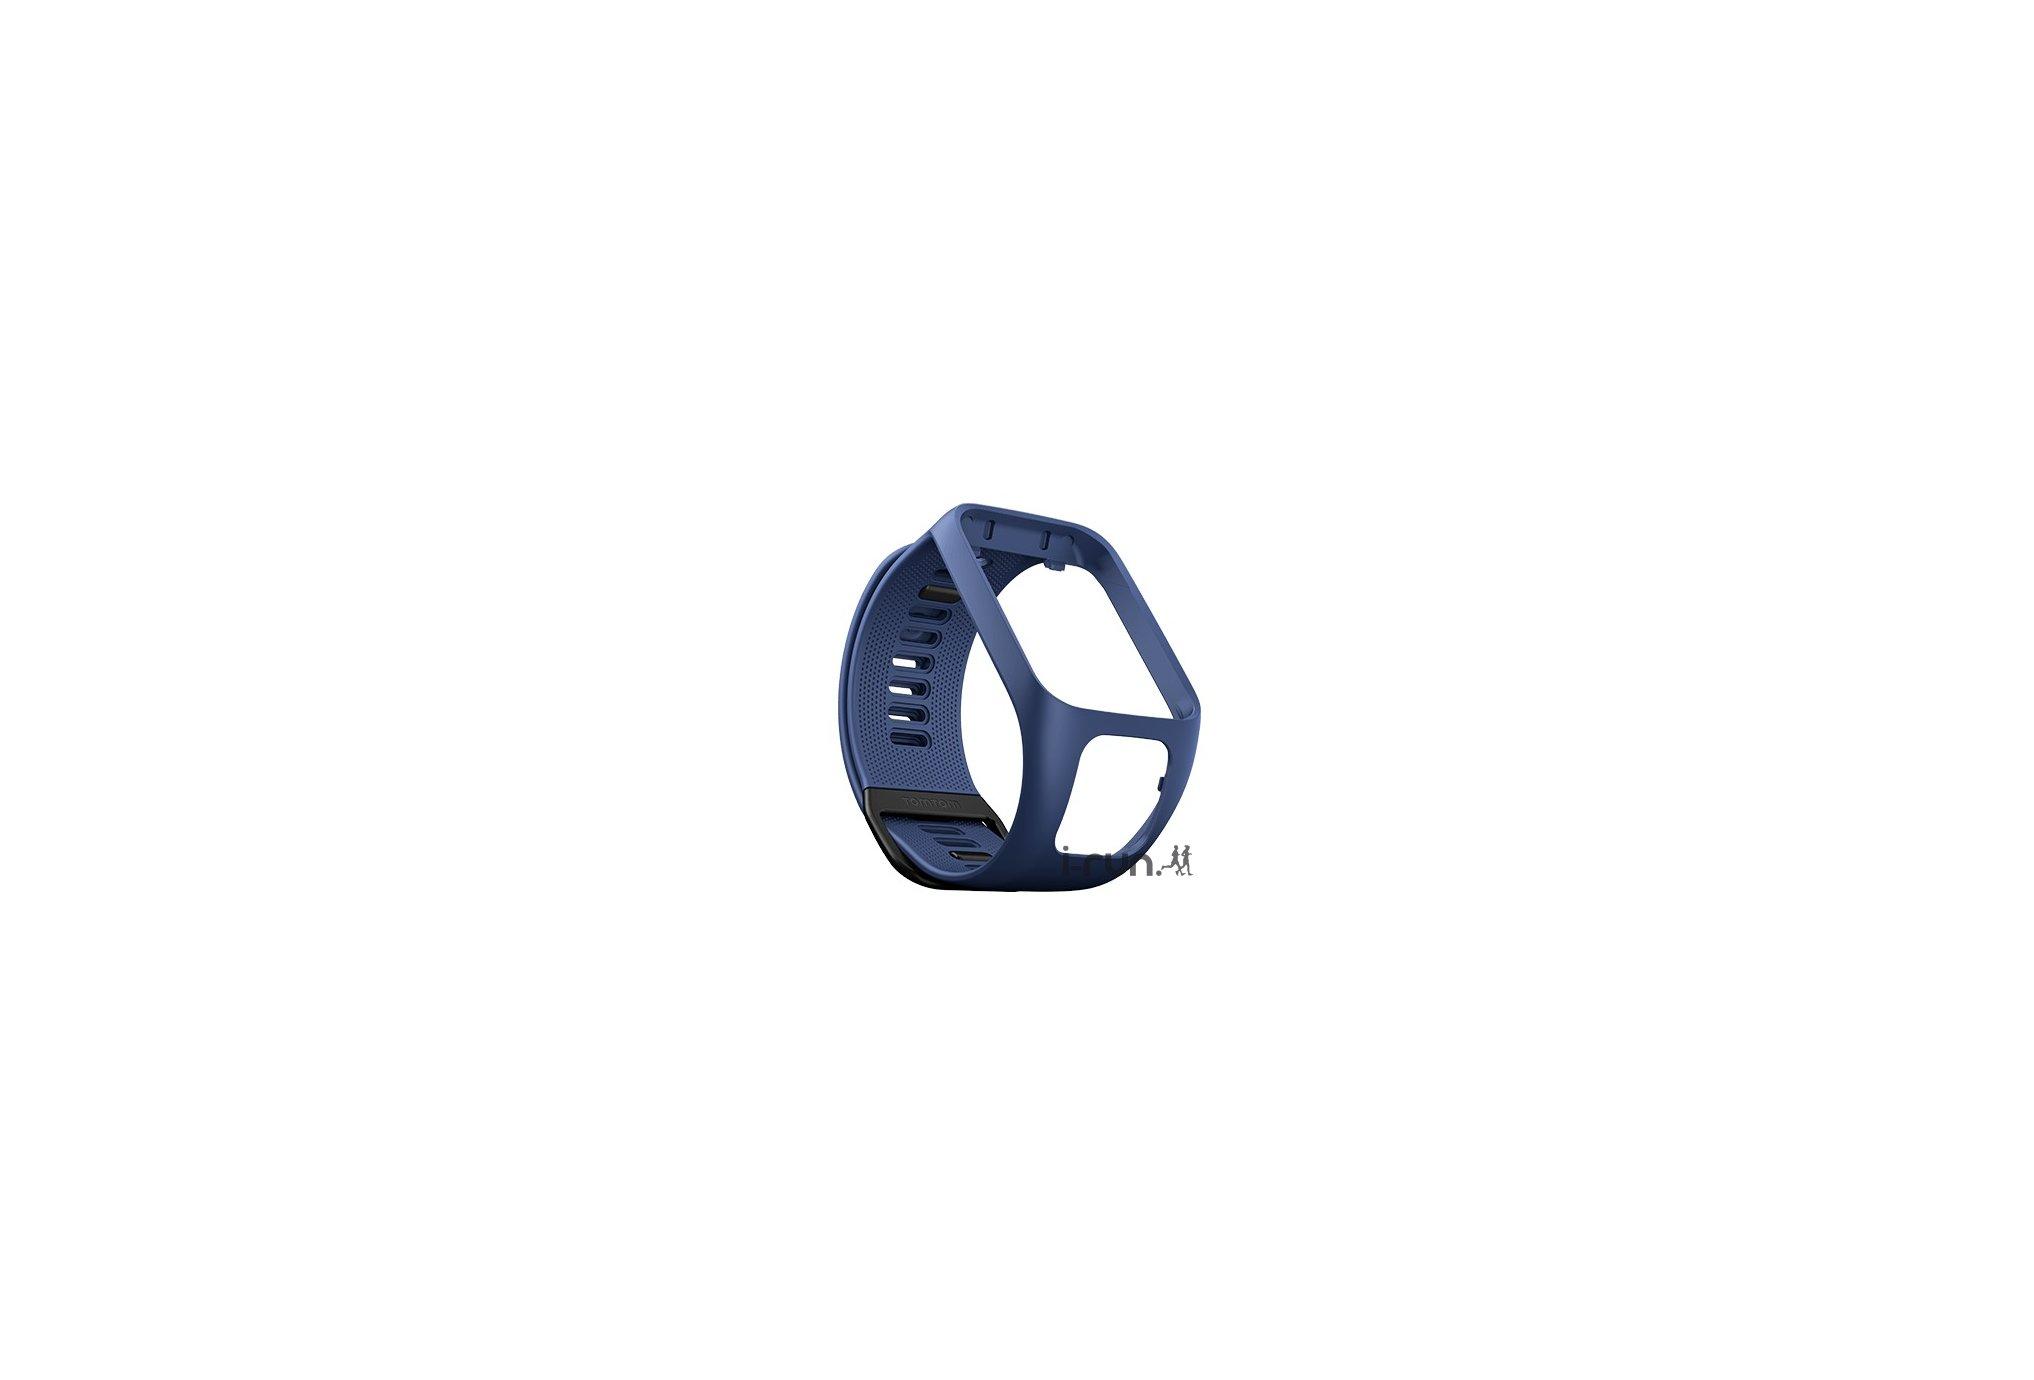 Tomtom Bracelet montre spark/runner/adventurer - large accessoires montres/ bracelets